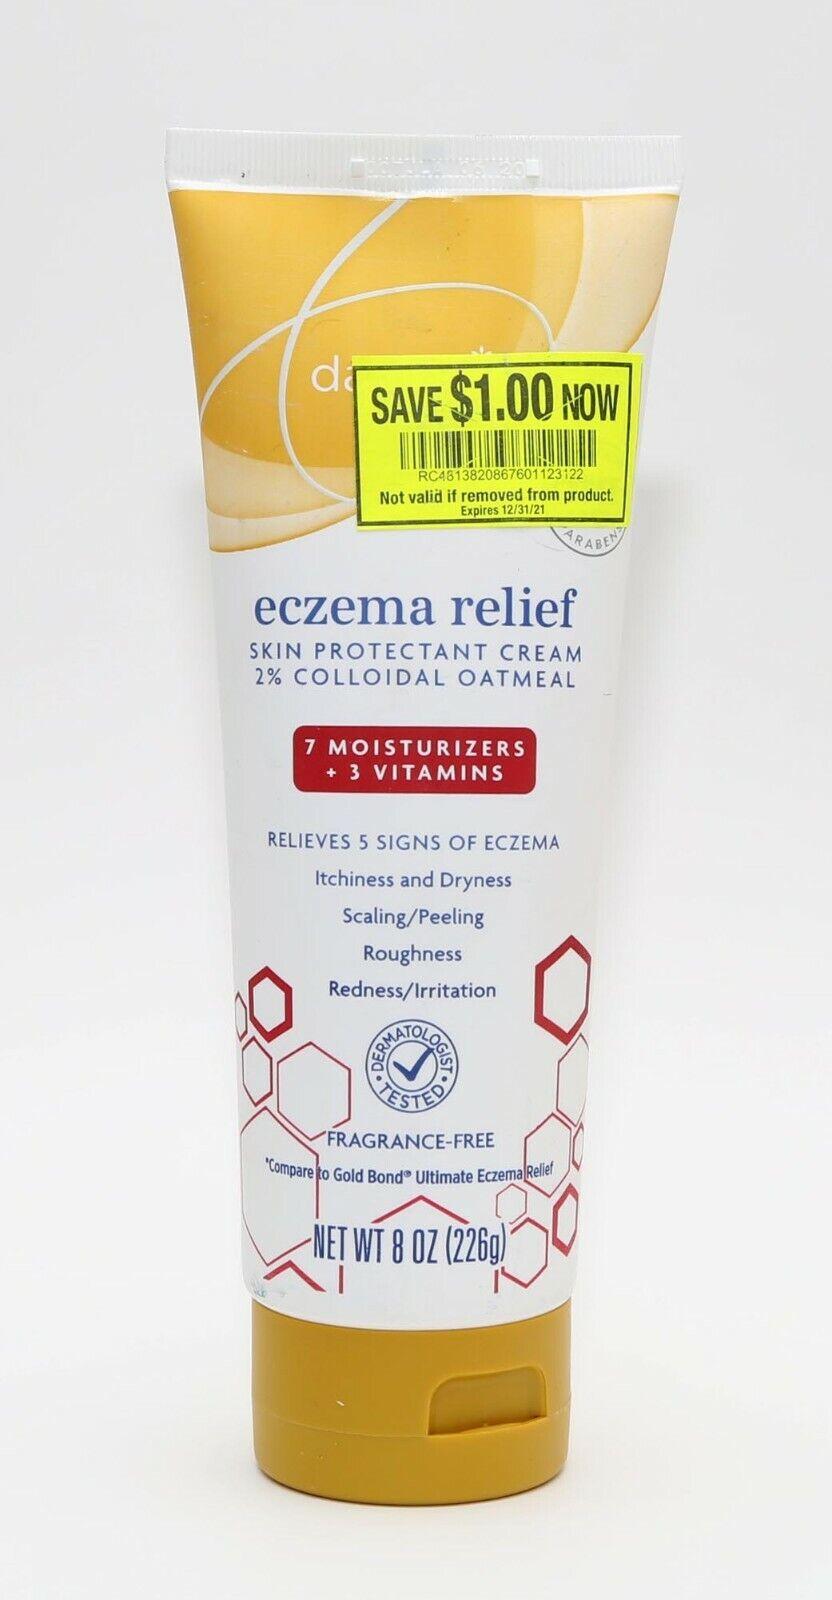 Daylogic Eczema Relief Skin Protectant Cream 8 oz -2% Colloi